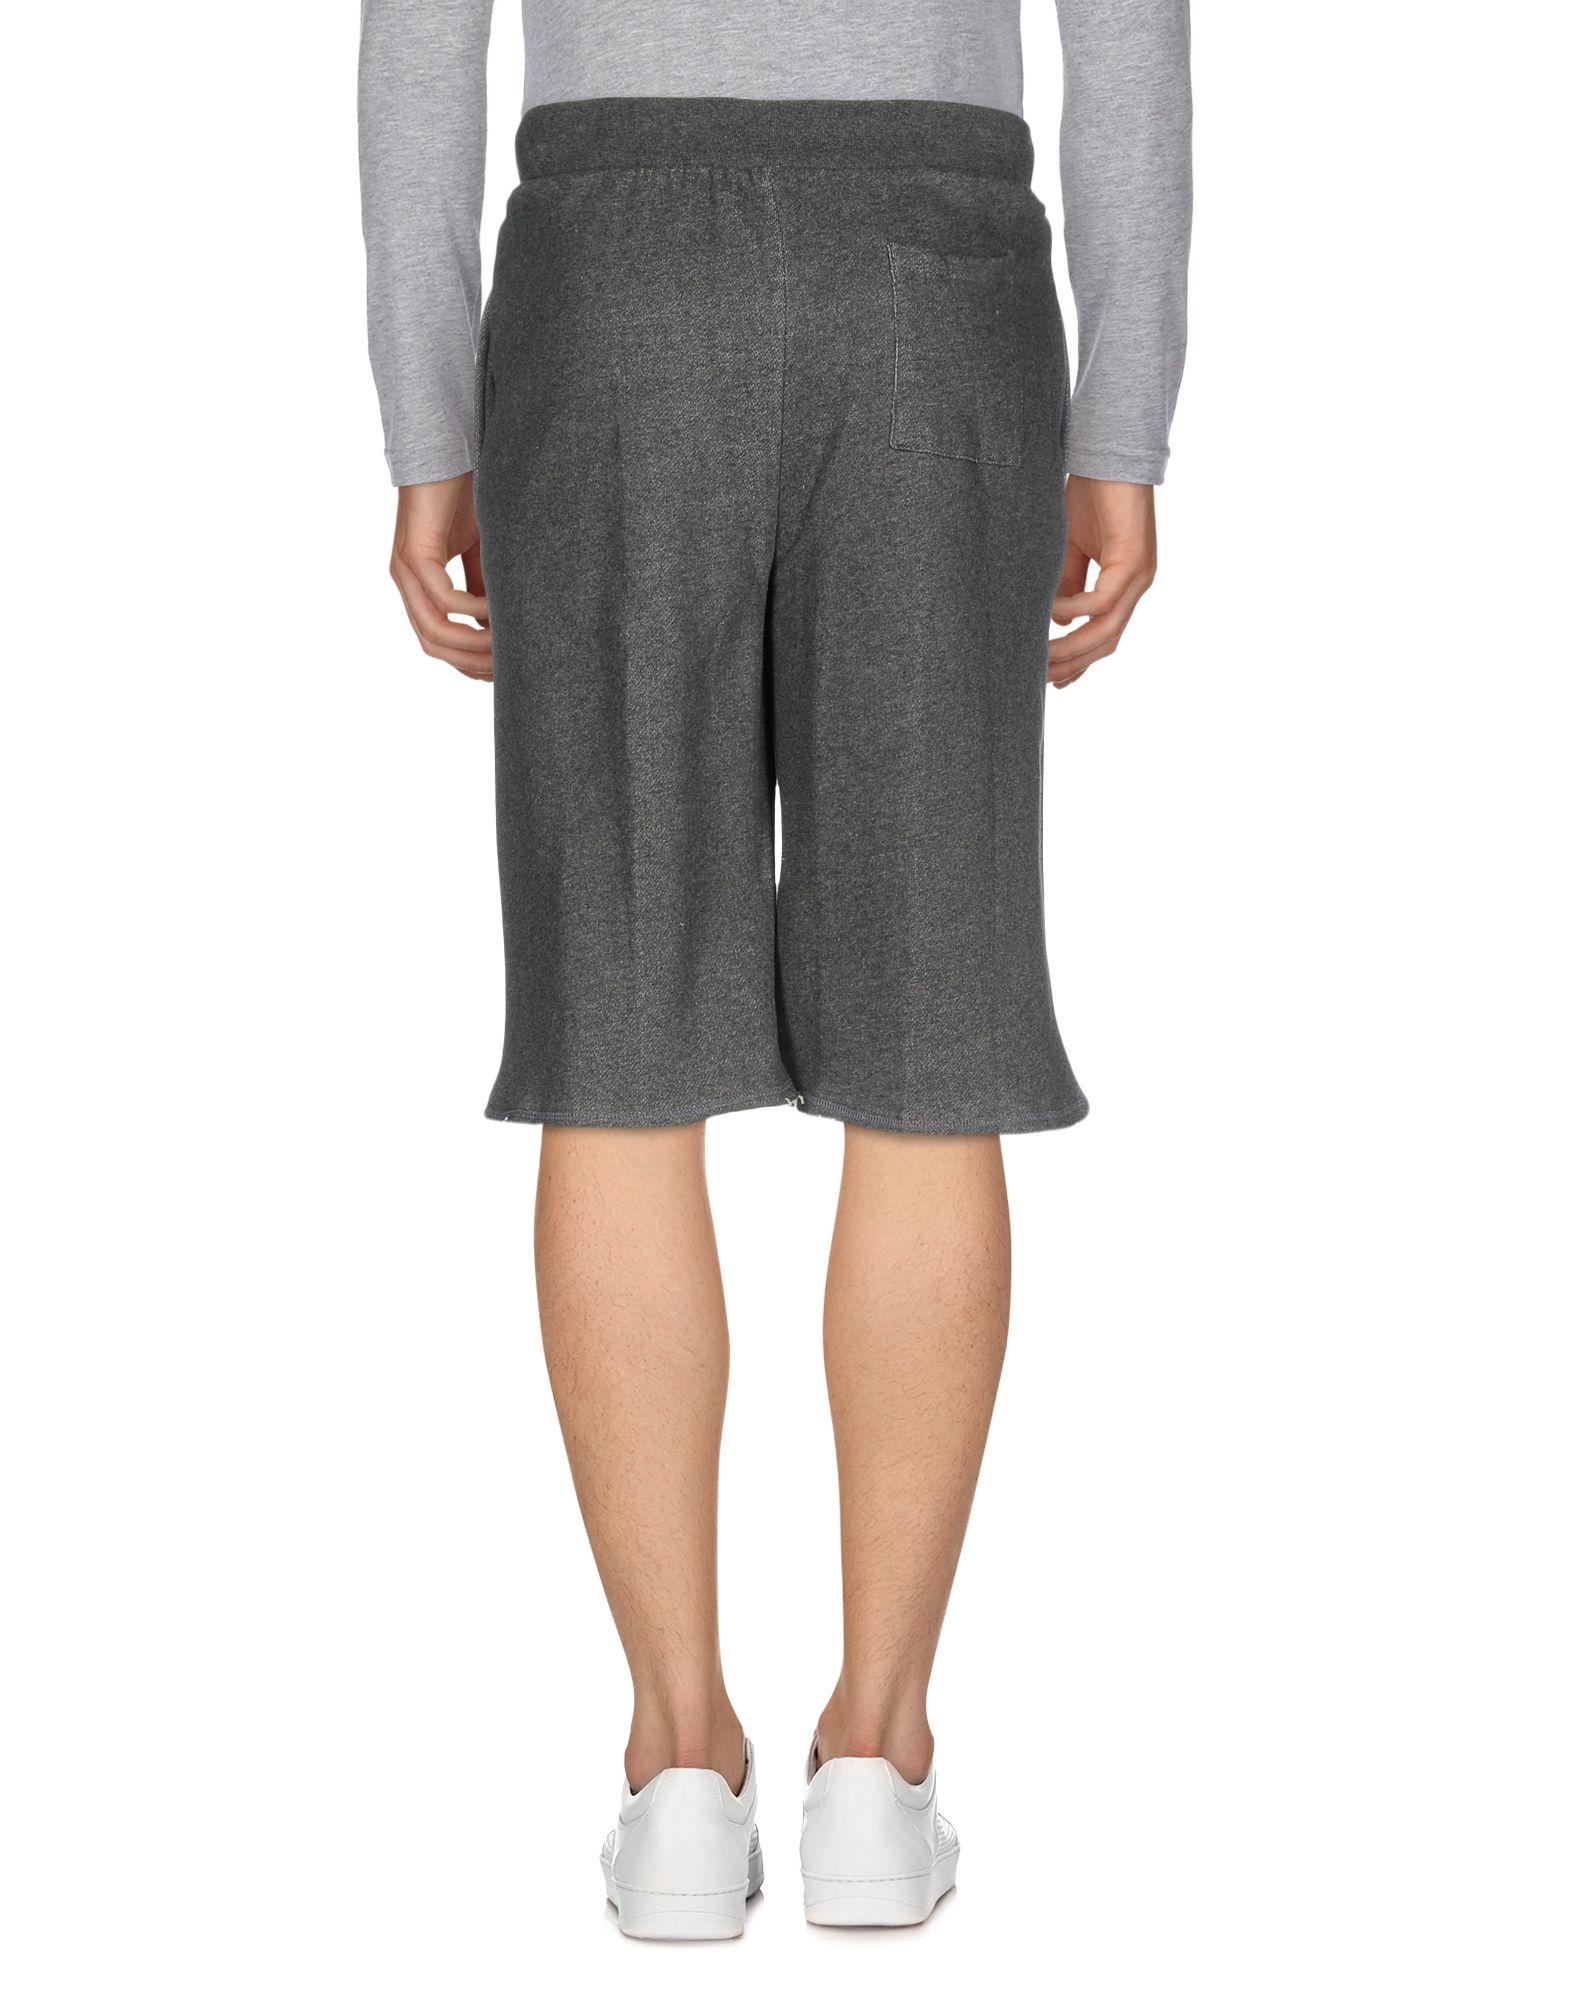 Pantalone Felpa Uomo American Vintage Uomo Felpa - 13141014SG 791d5a